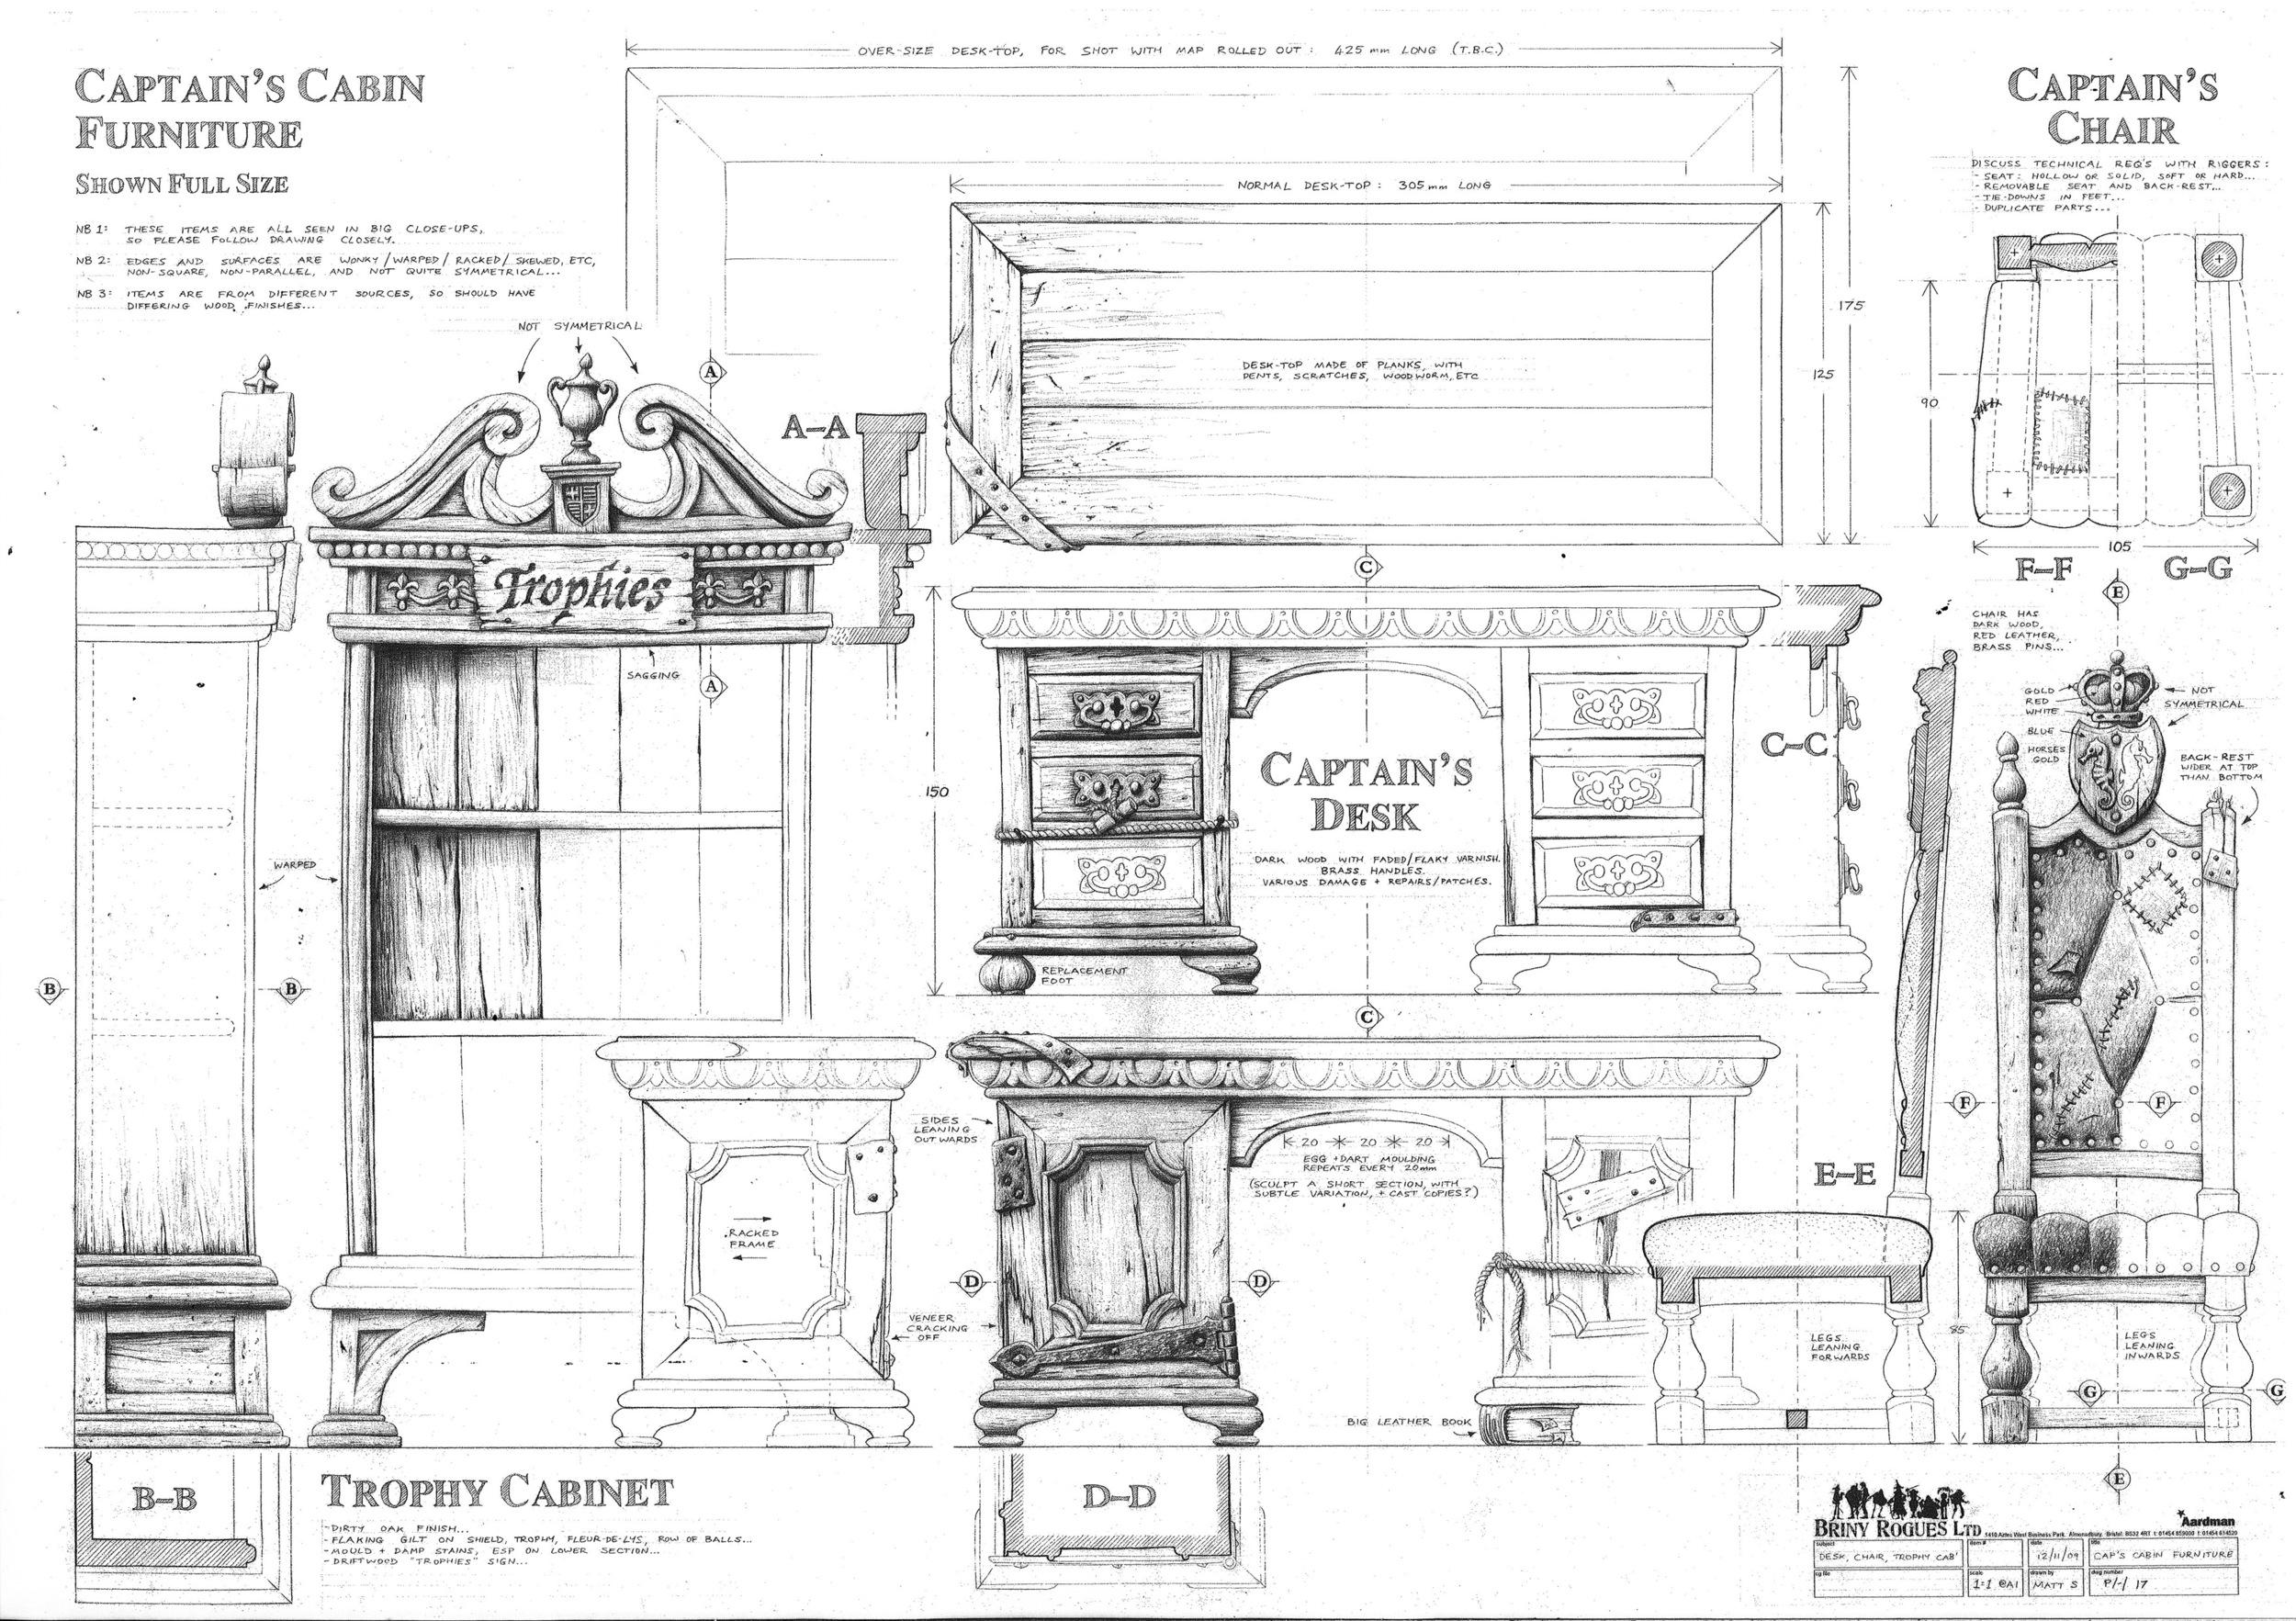 Cap Cabin Furniture Drg.jpg